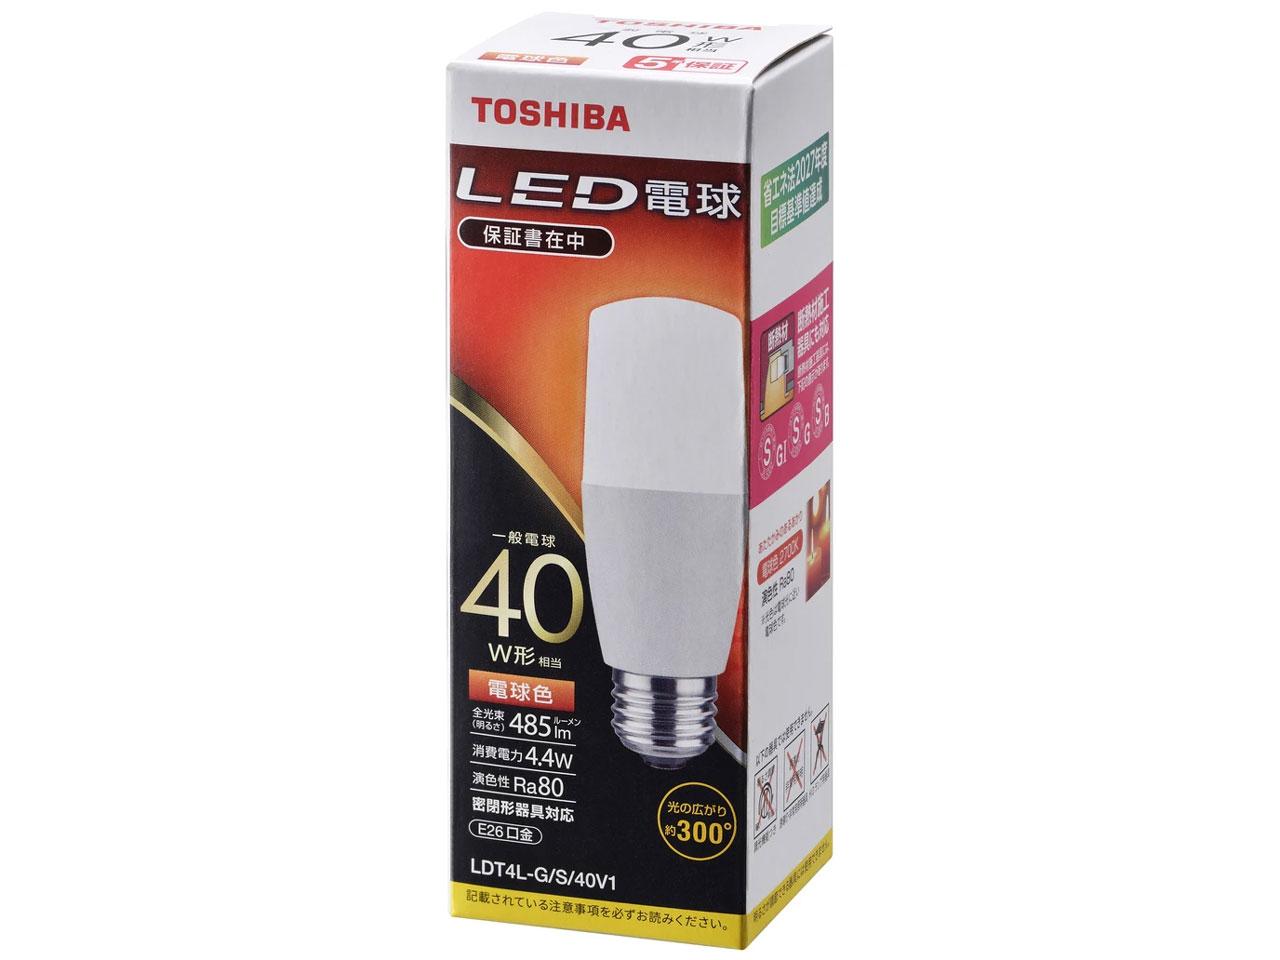 LDT4L-G/S/40V1 [電球色] の製品画像